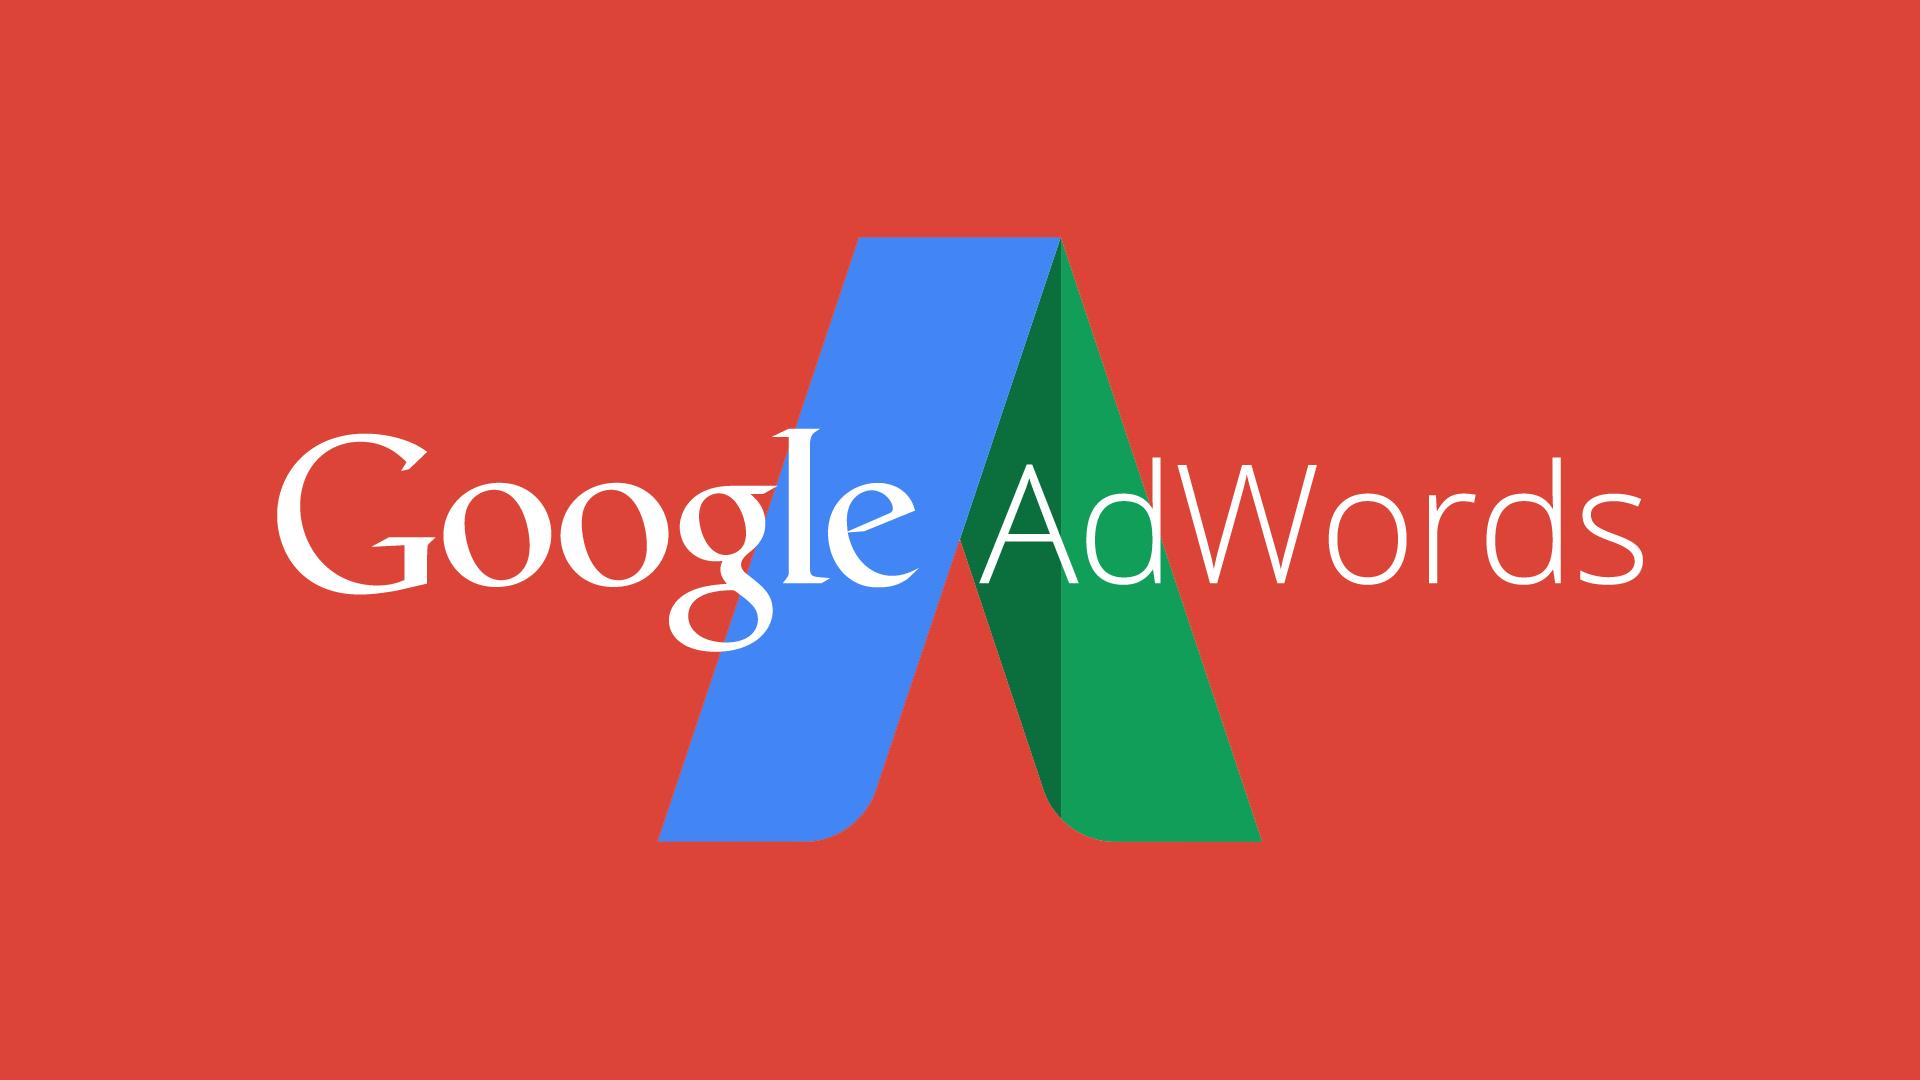 Types Of Bidding Strategies In Google Adwords